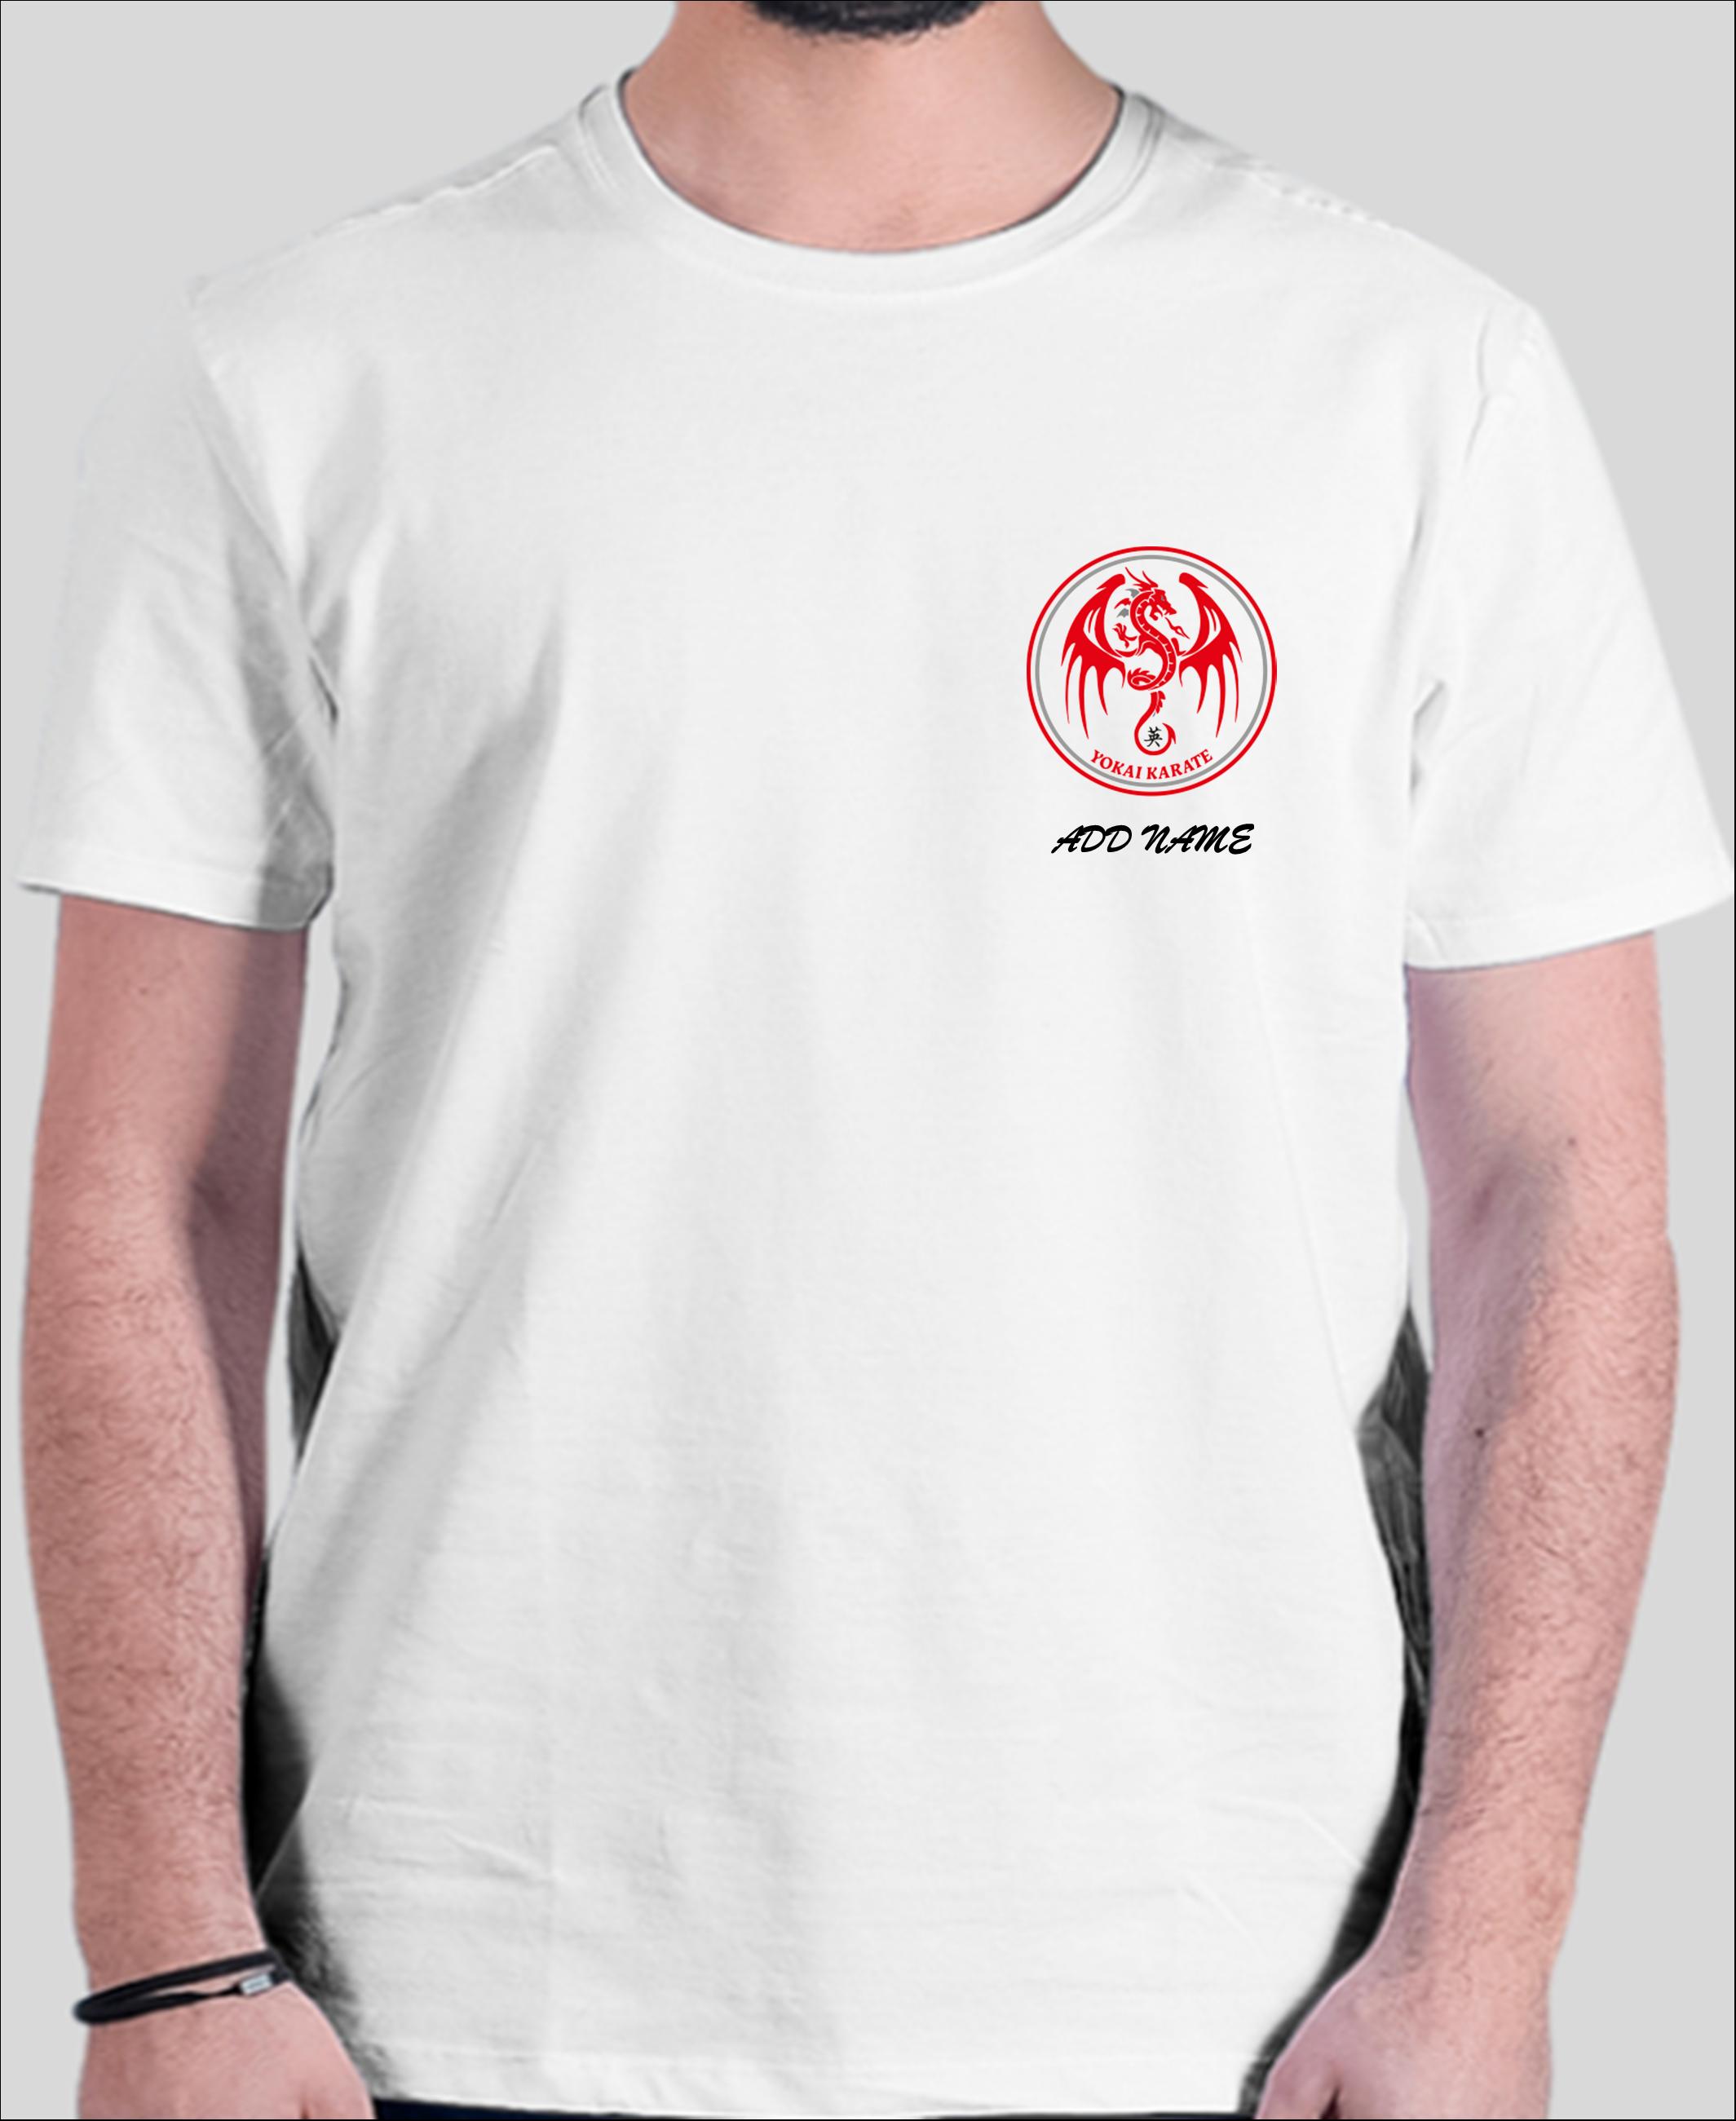 Yokai Karate-002 T-Shirt cool white training.